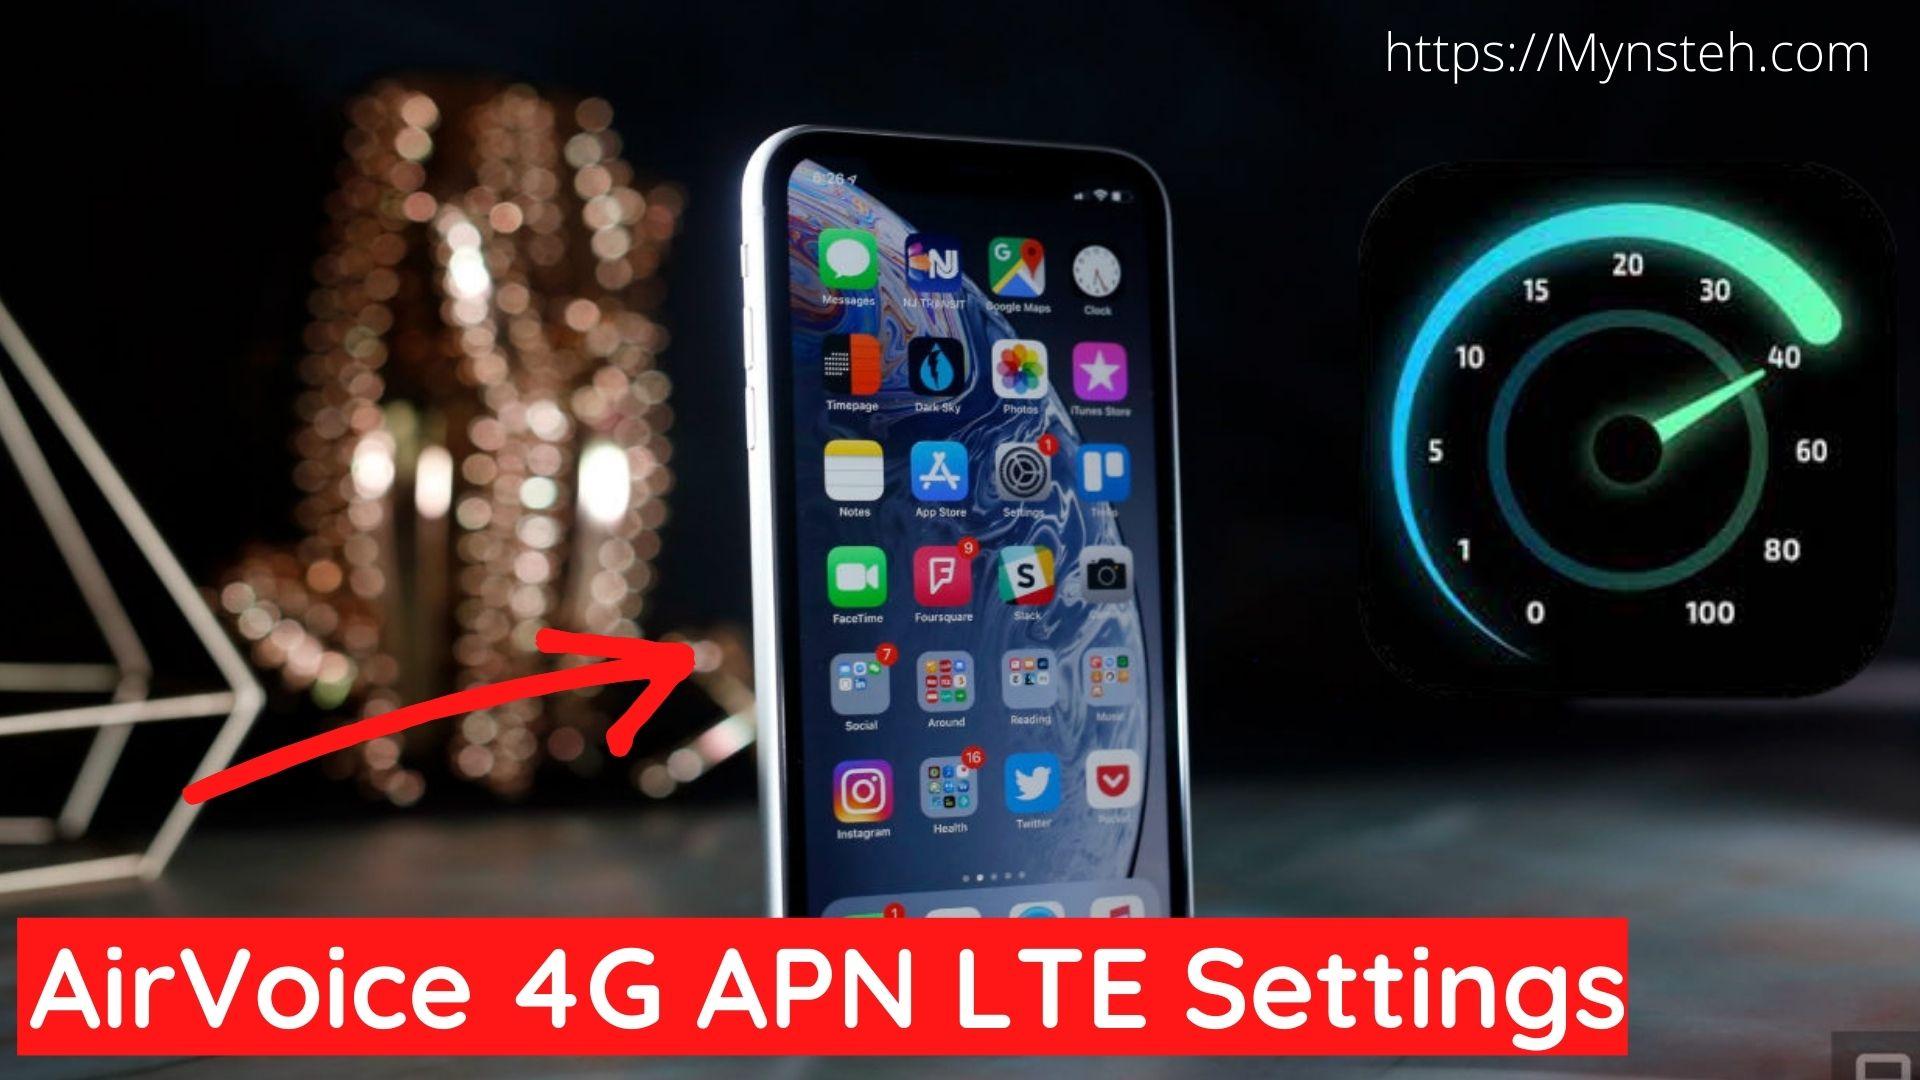 AirVoice 4G APN LTE Settings